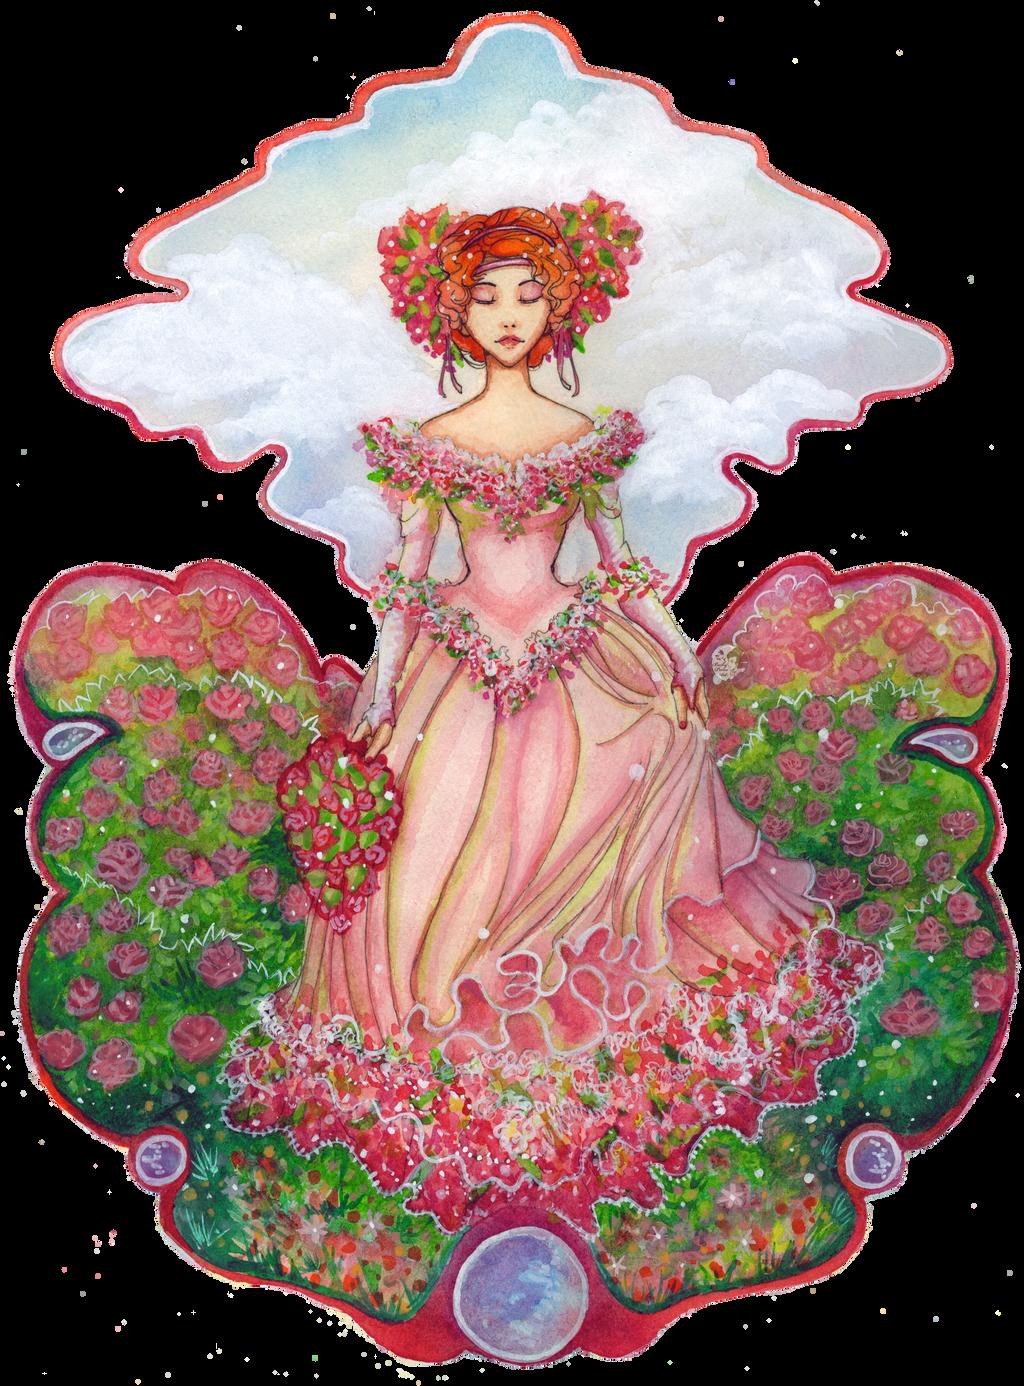 Rose Garden Valentine Watercolor by BeckyPennArt